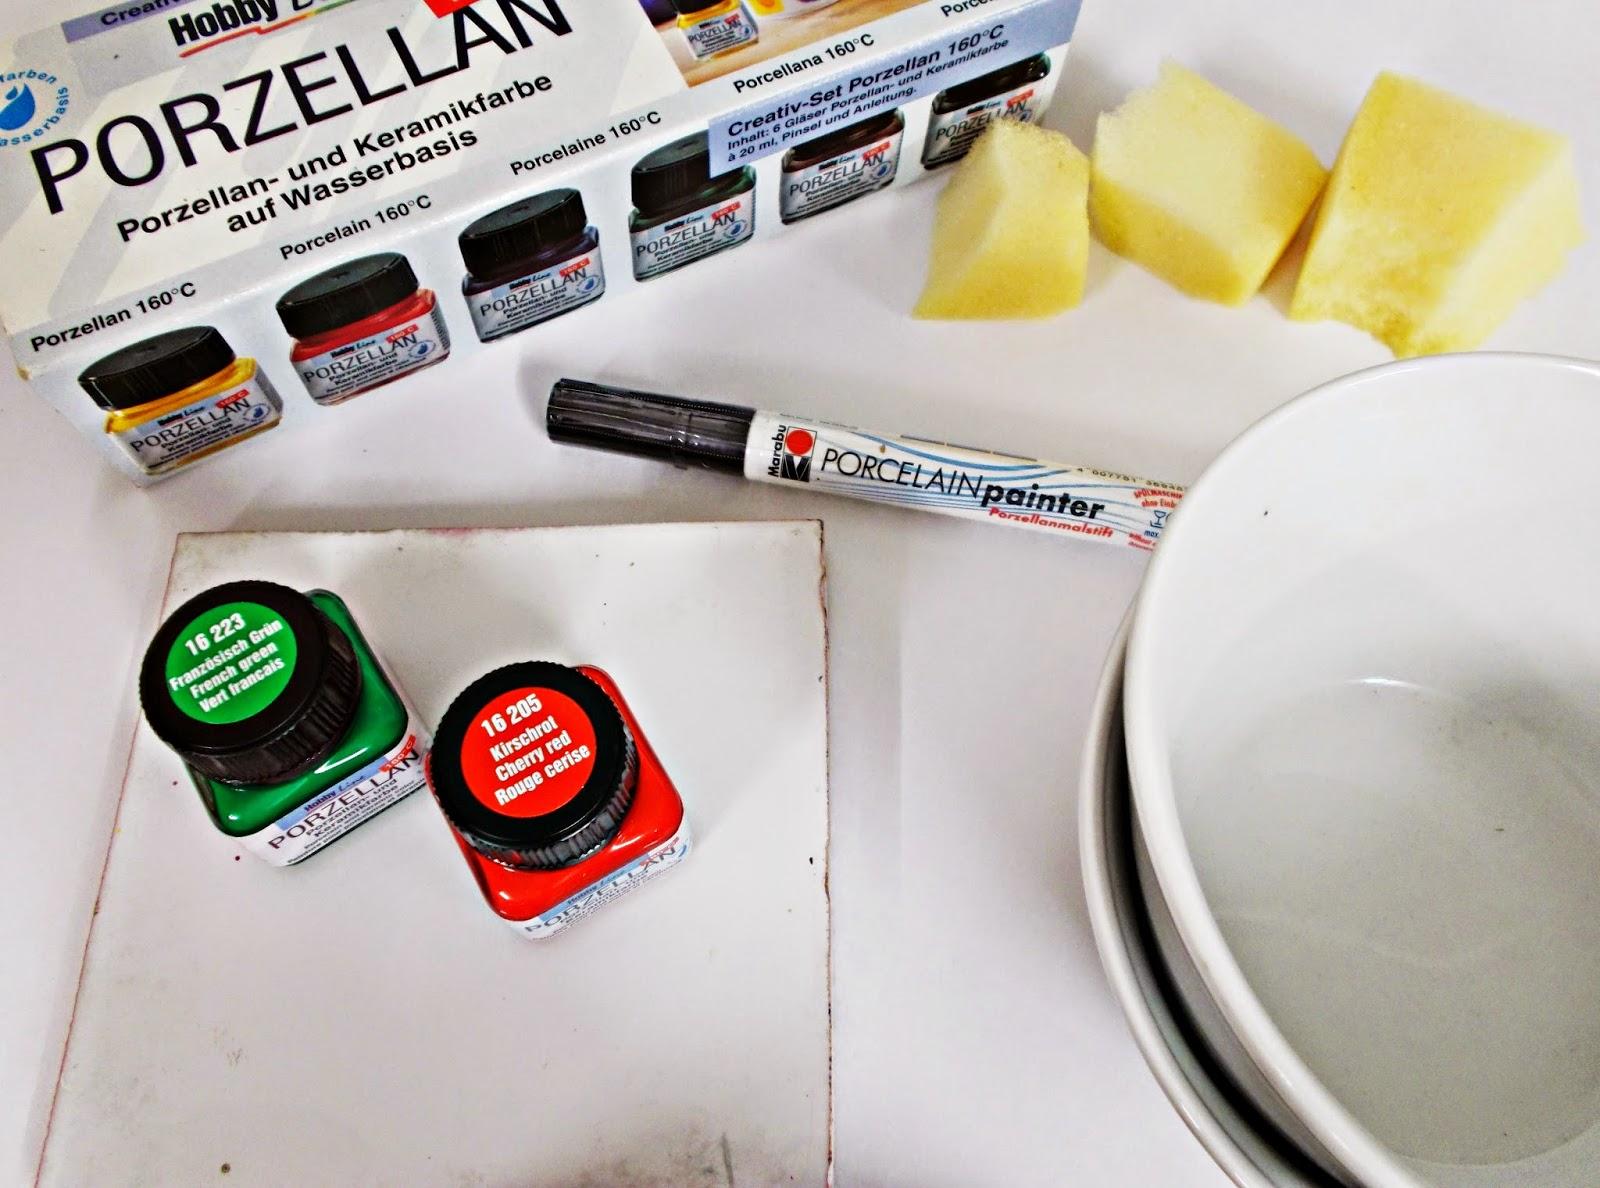 DIY-porcelana-pintar-porcelain-porzellan-sandía-DIYviertete-2